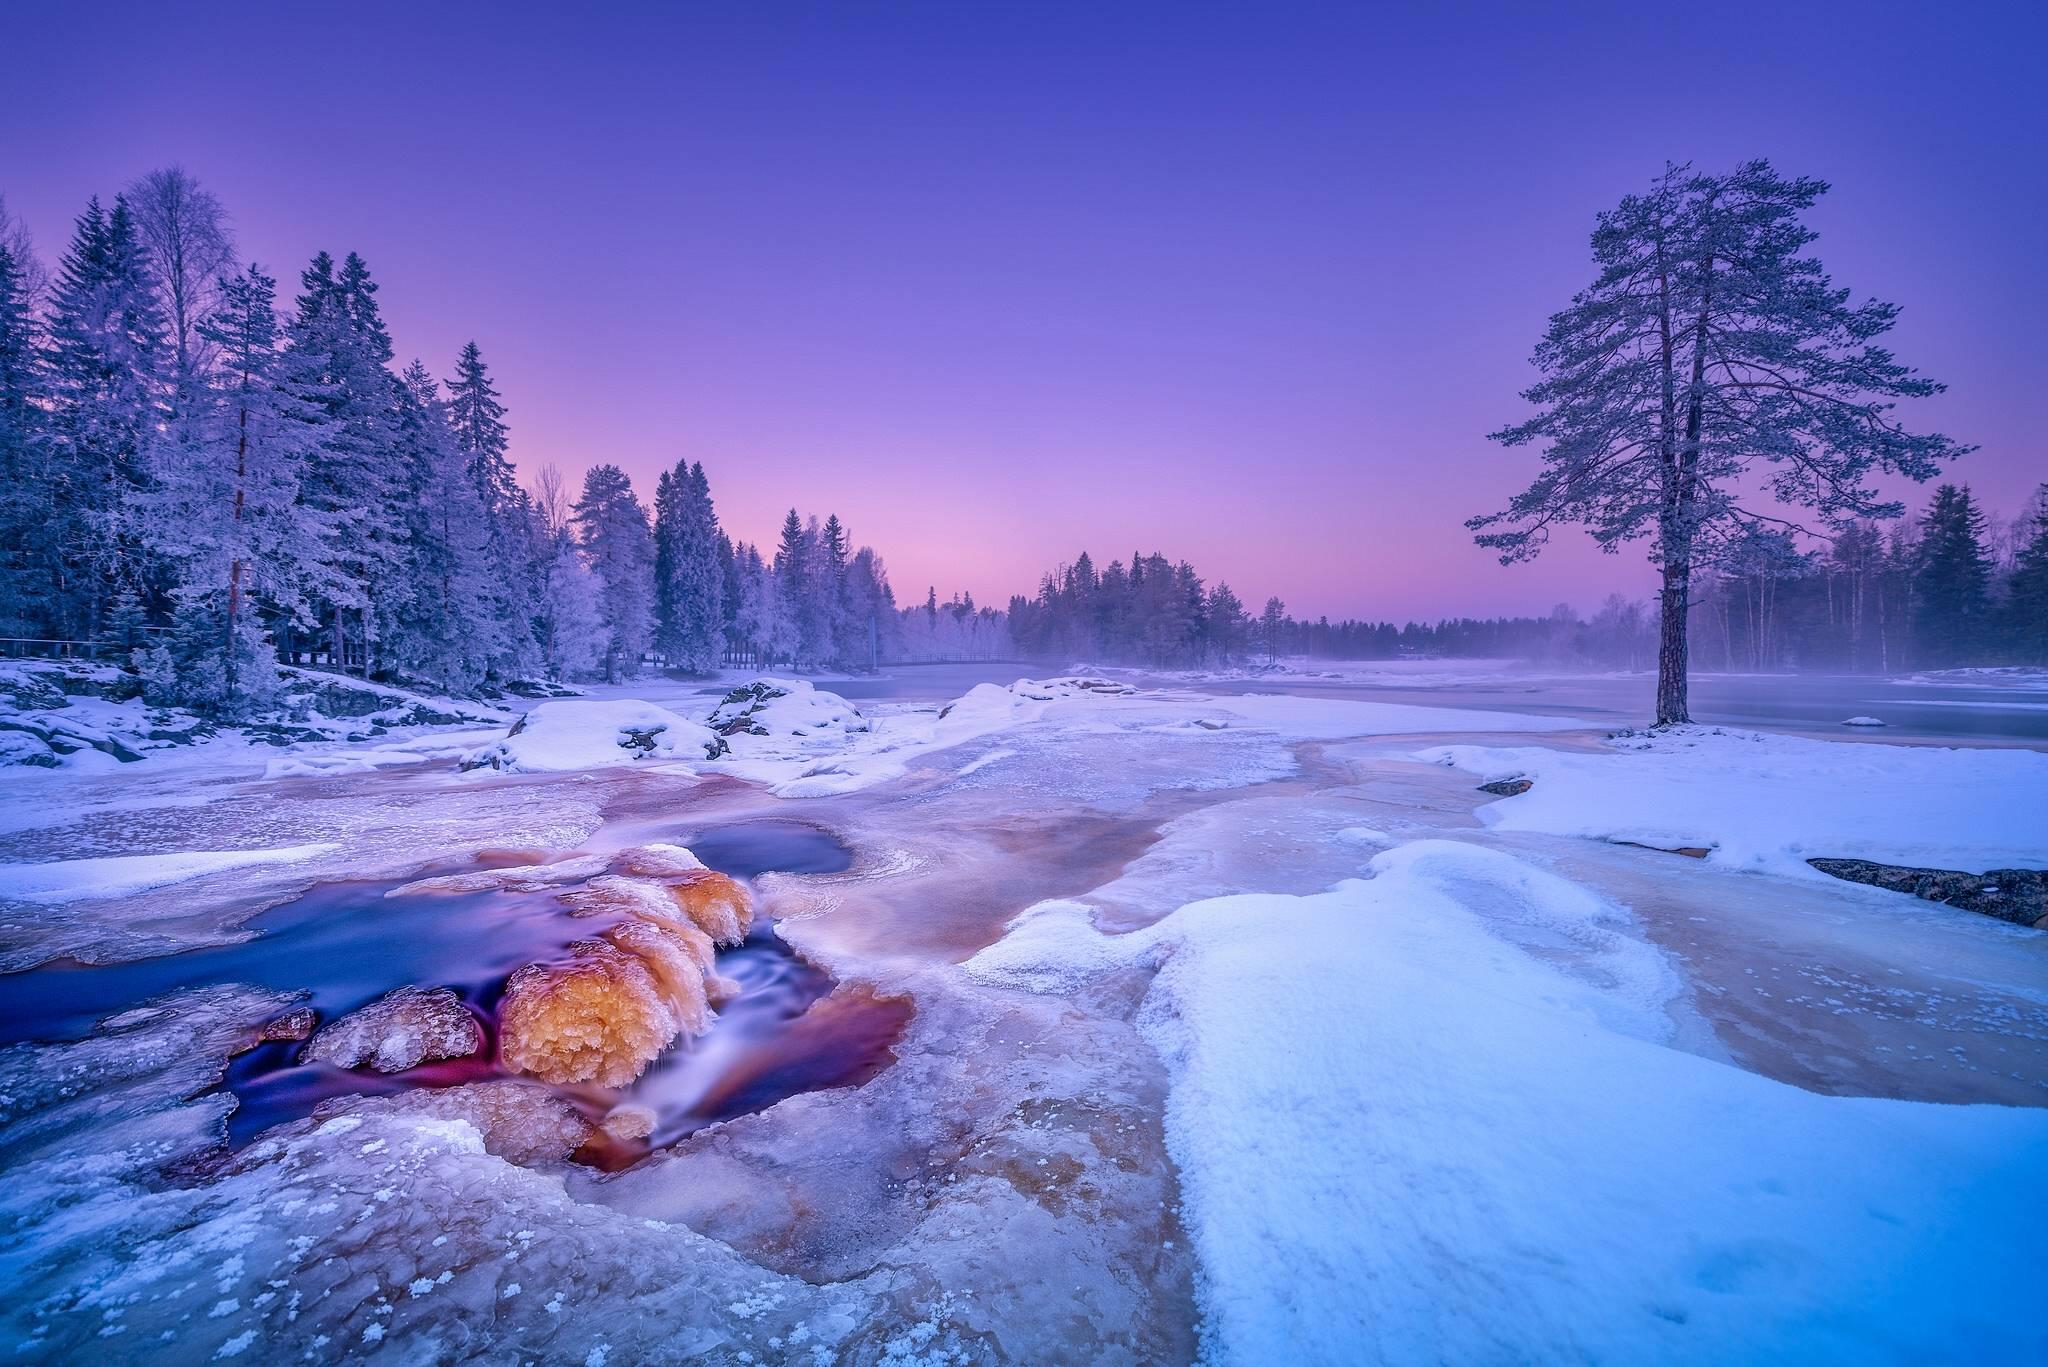 Kiiminkijoki River, Finland, река Кииминкийоки